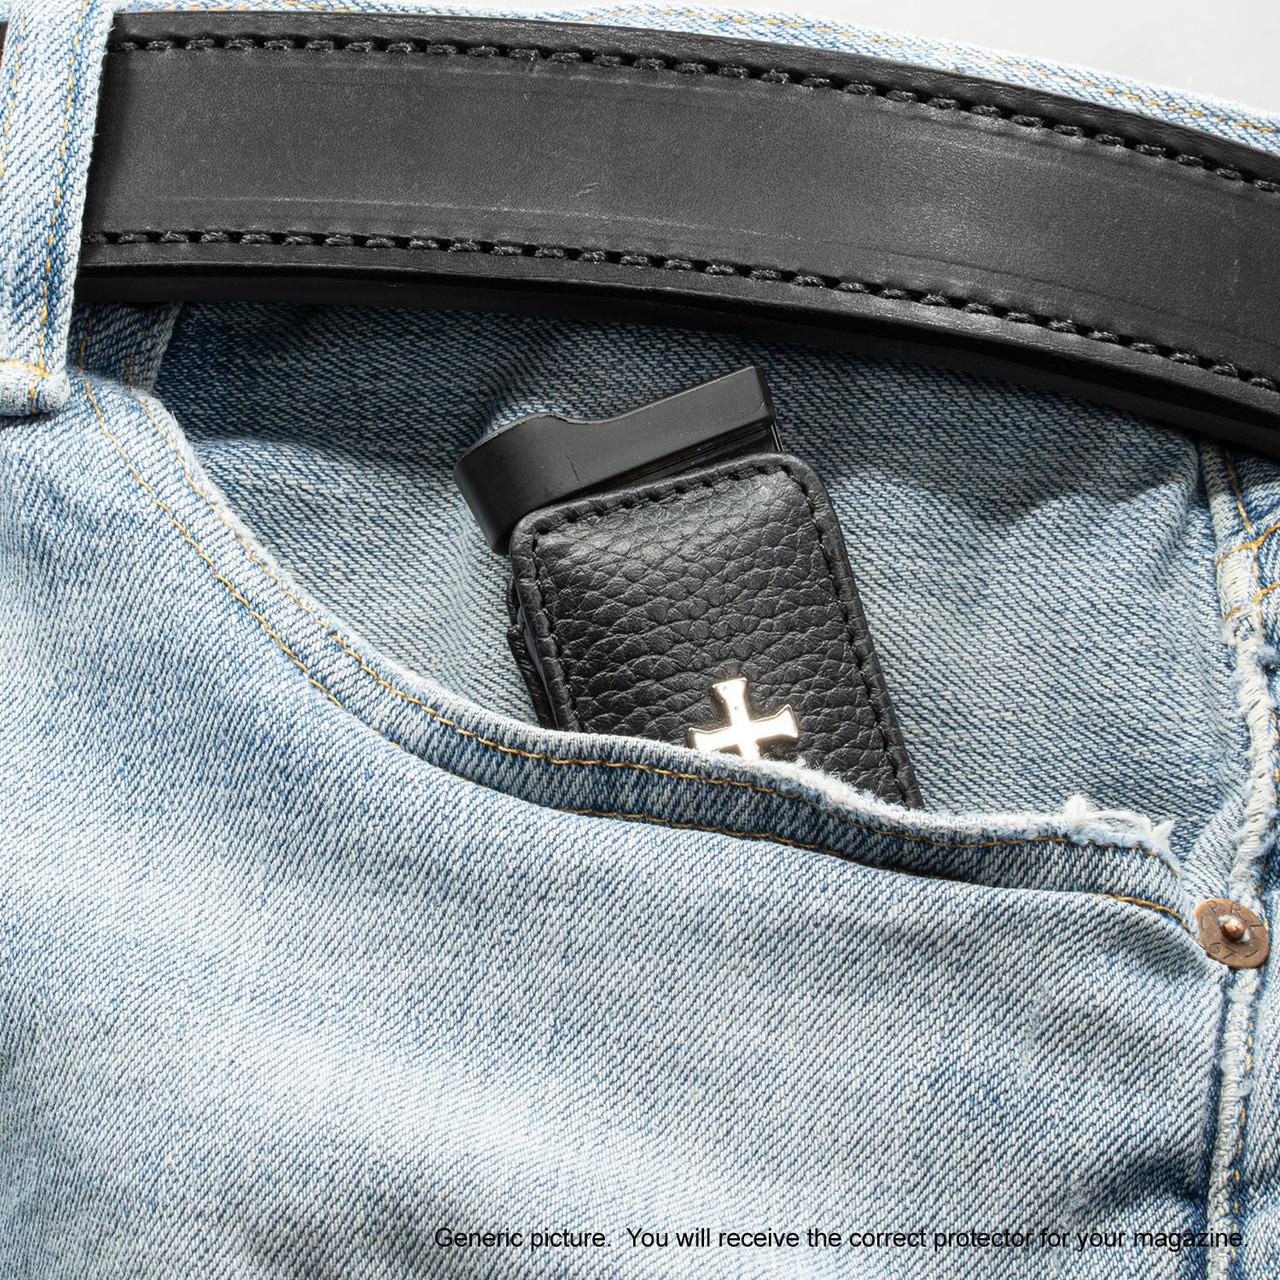 CZ 75D Compact Black Cross Magazine Pocket Protector